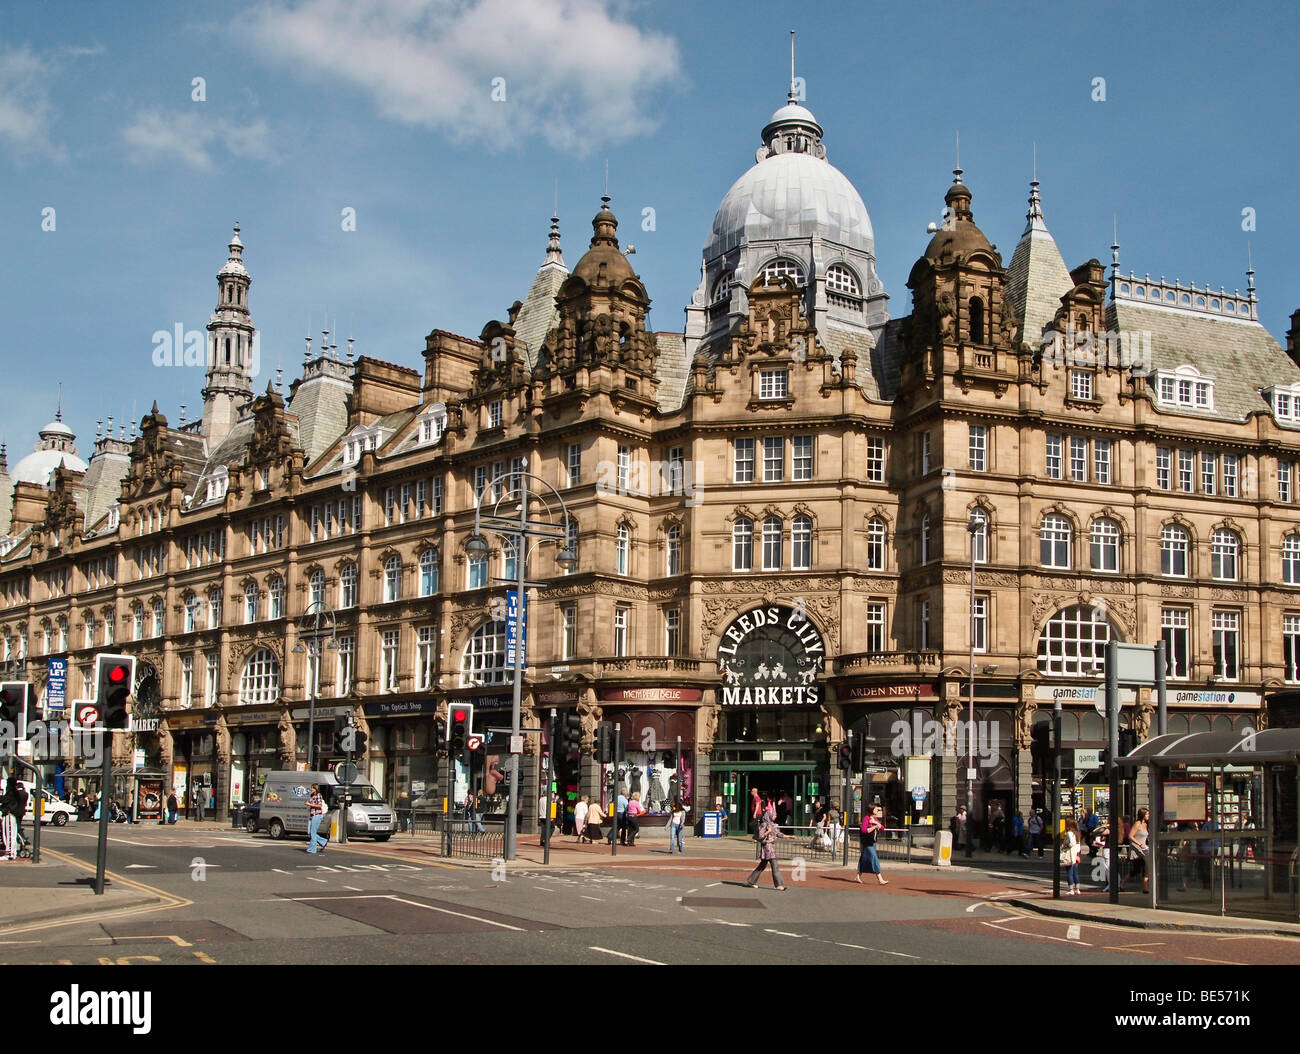 Facade of Leeds City Markets West Yorkshire UK - Stock Image